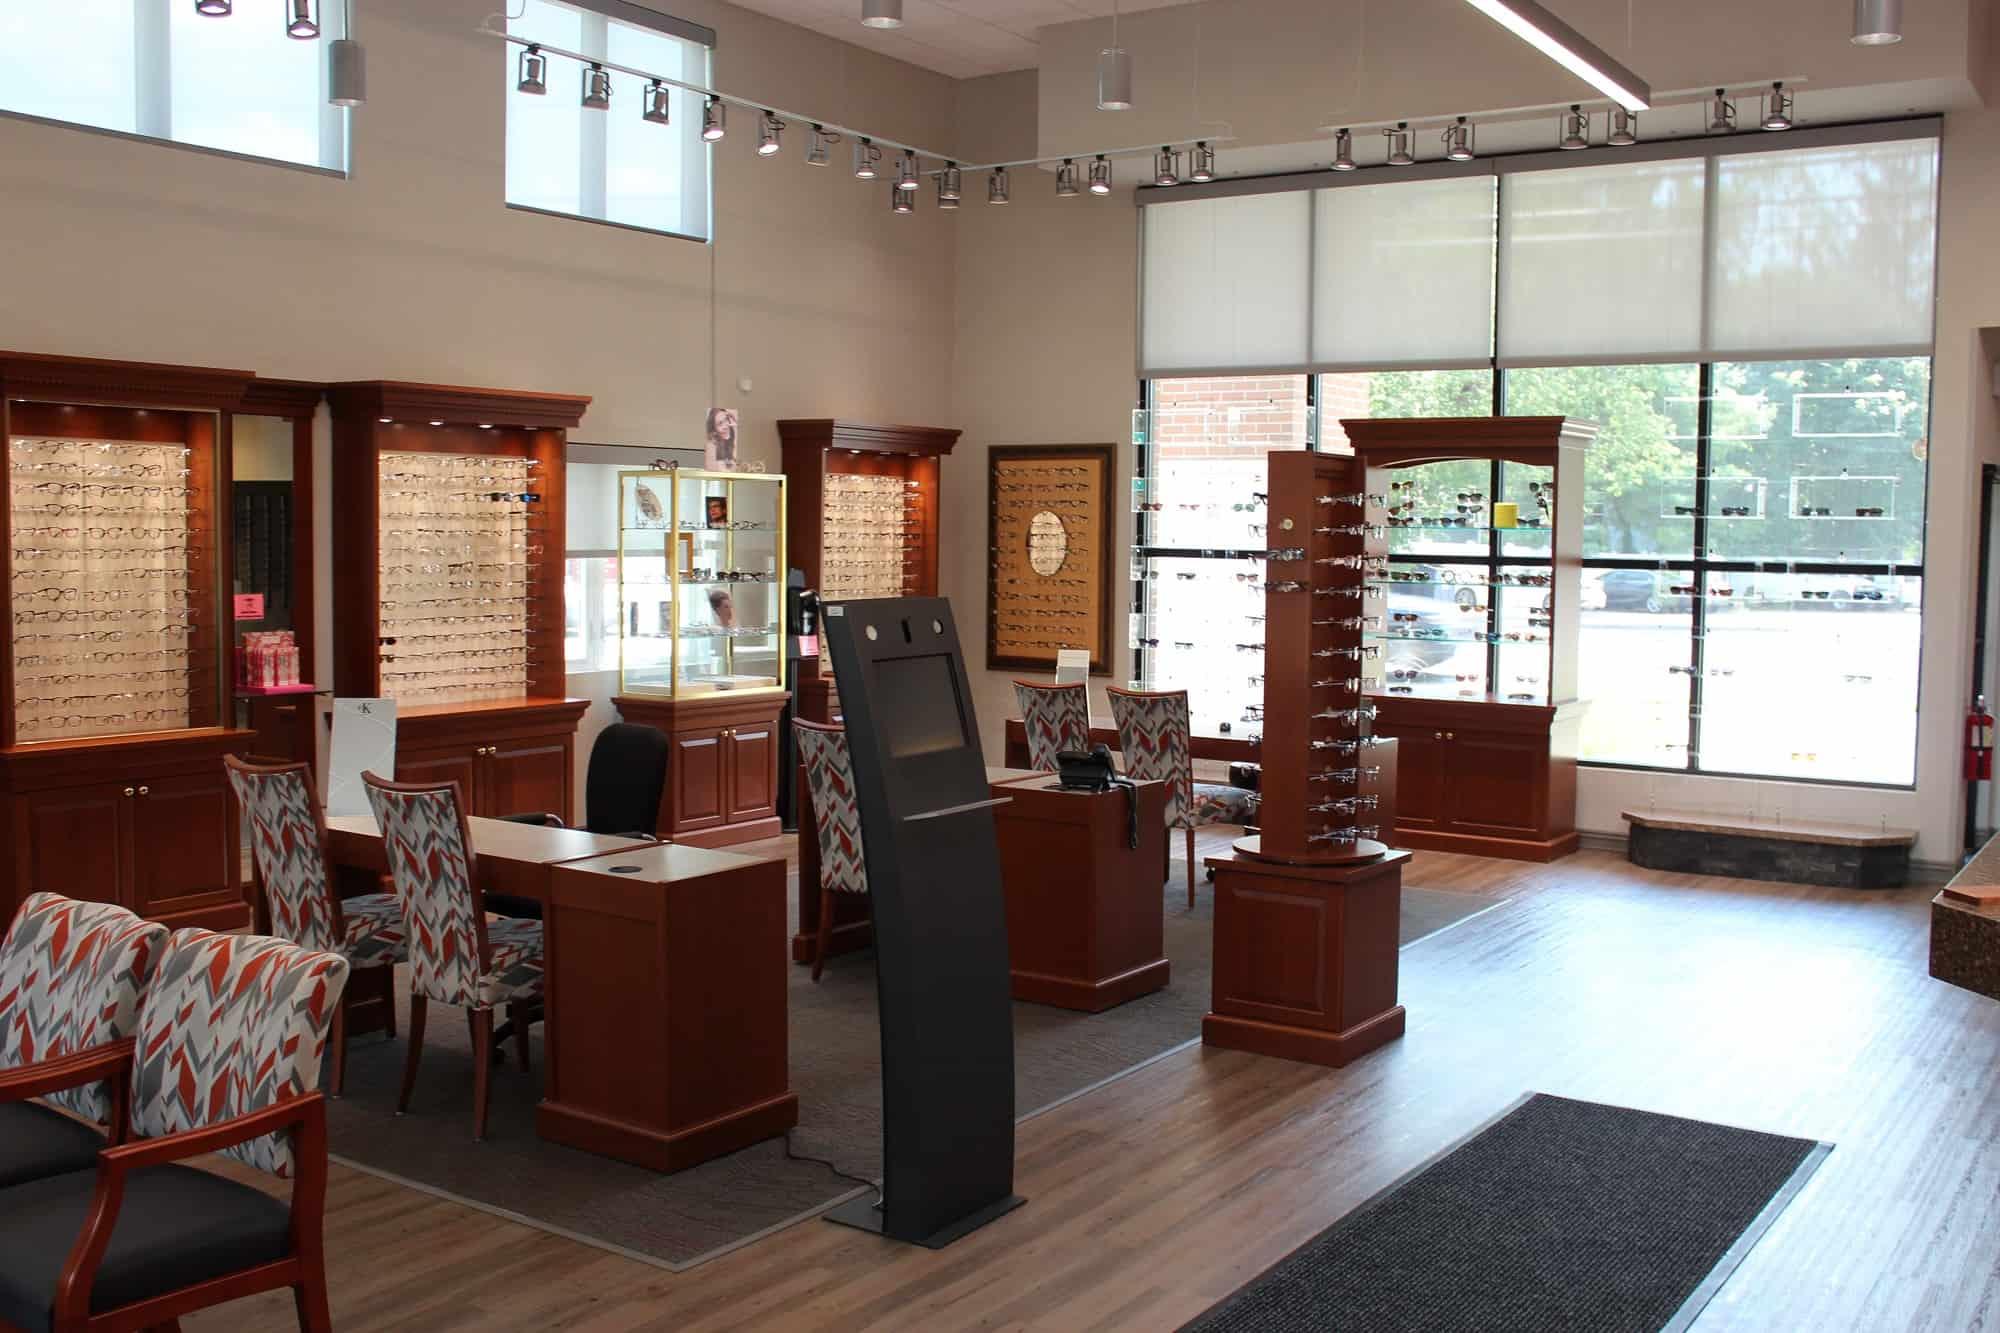 suffolk county eye doctor showroom